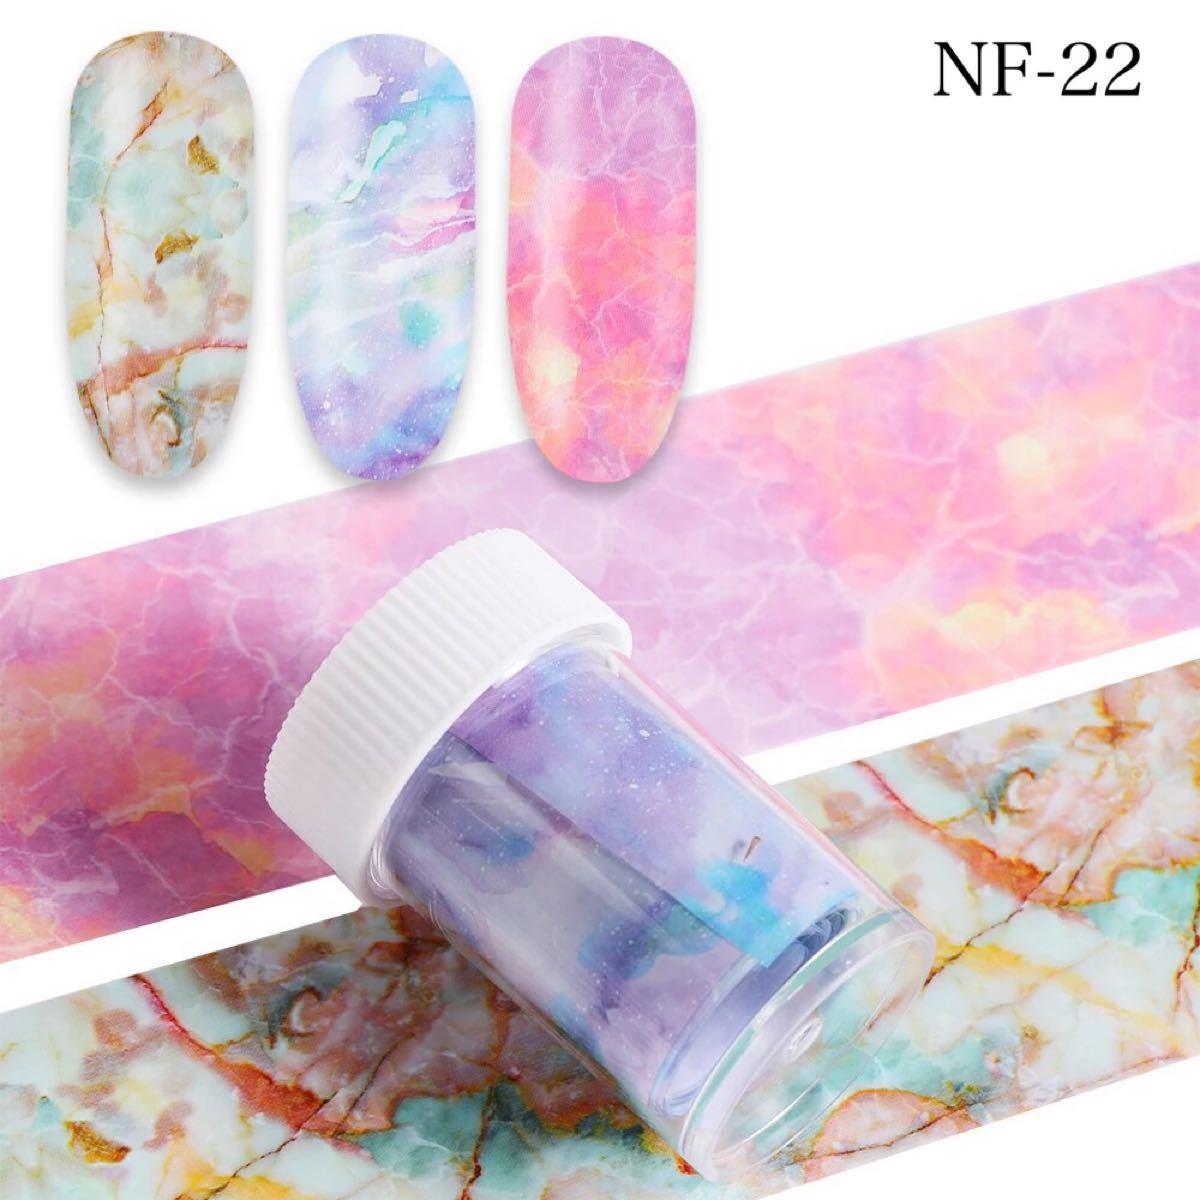 《NF-22》大理石ネイルホイル 3種セット